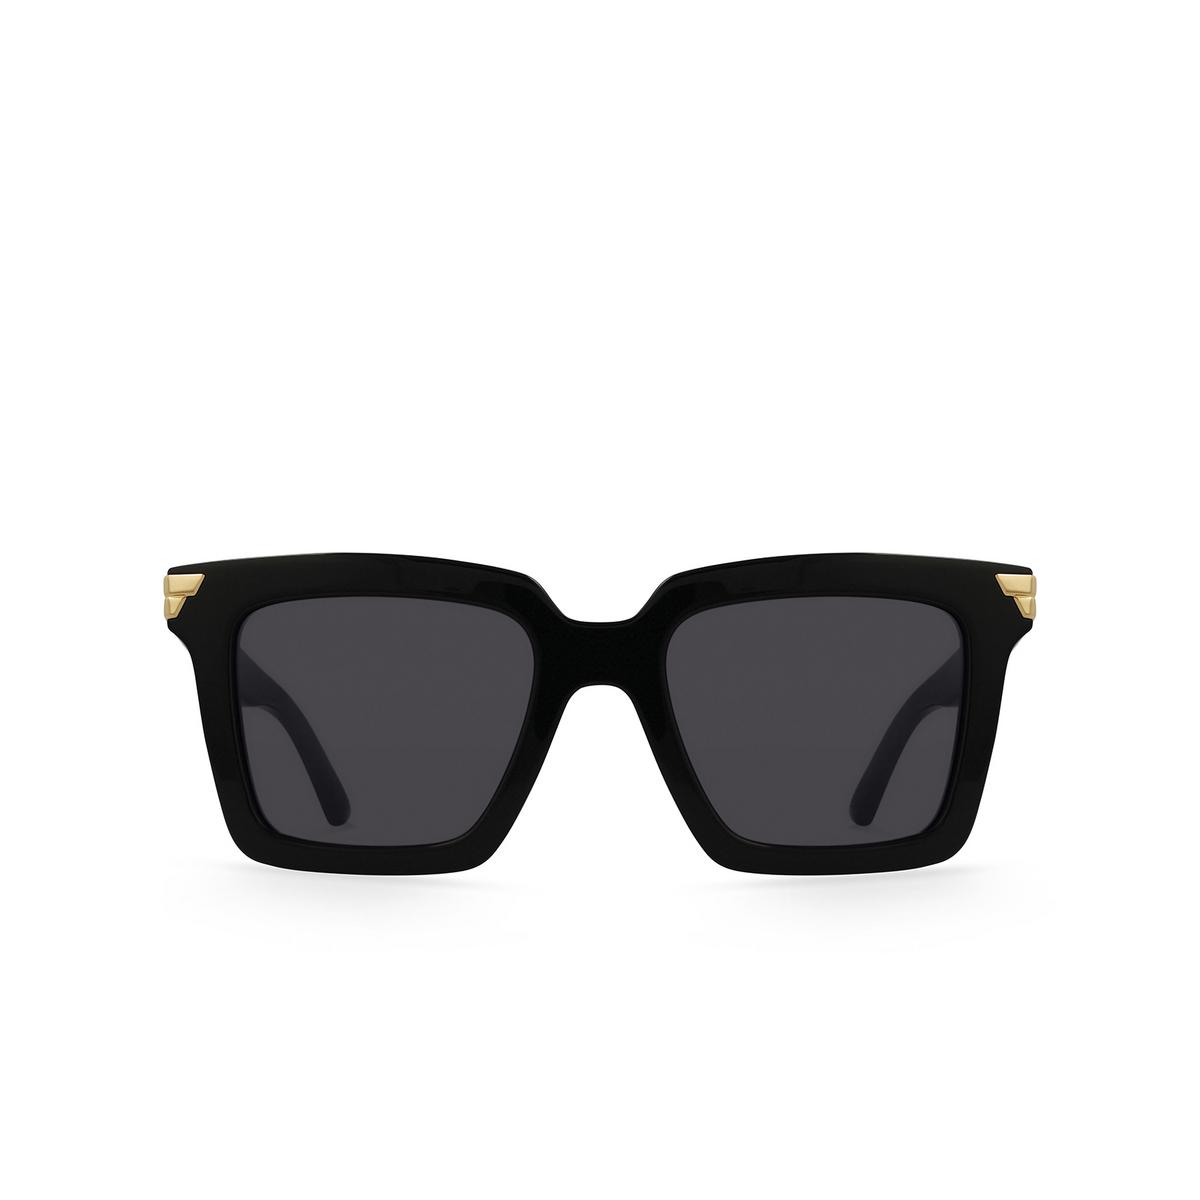 Bottega Veneta® Square Sunglasses: BV1005S color Black 001 - front view.